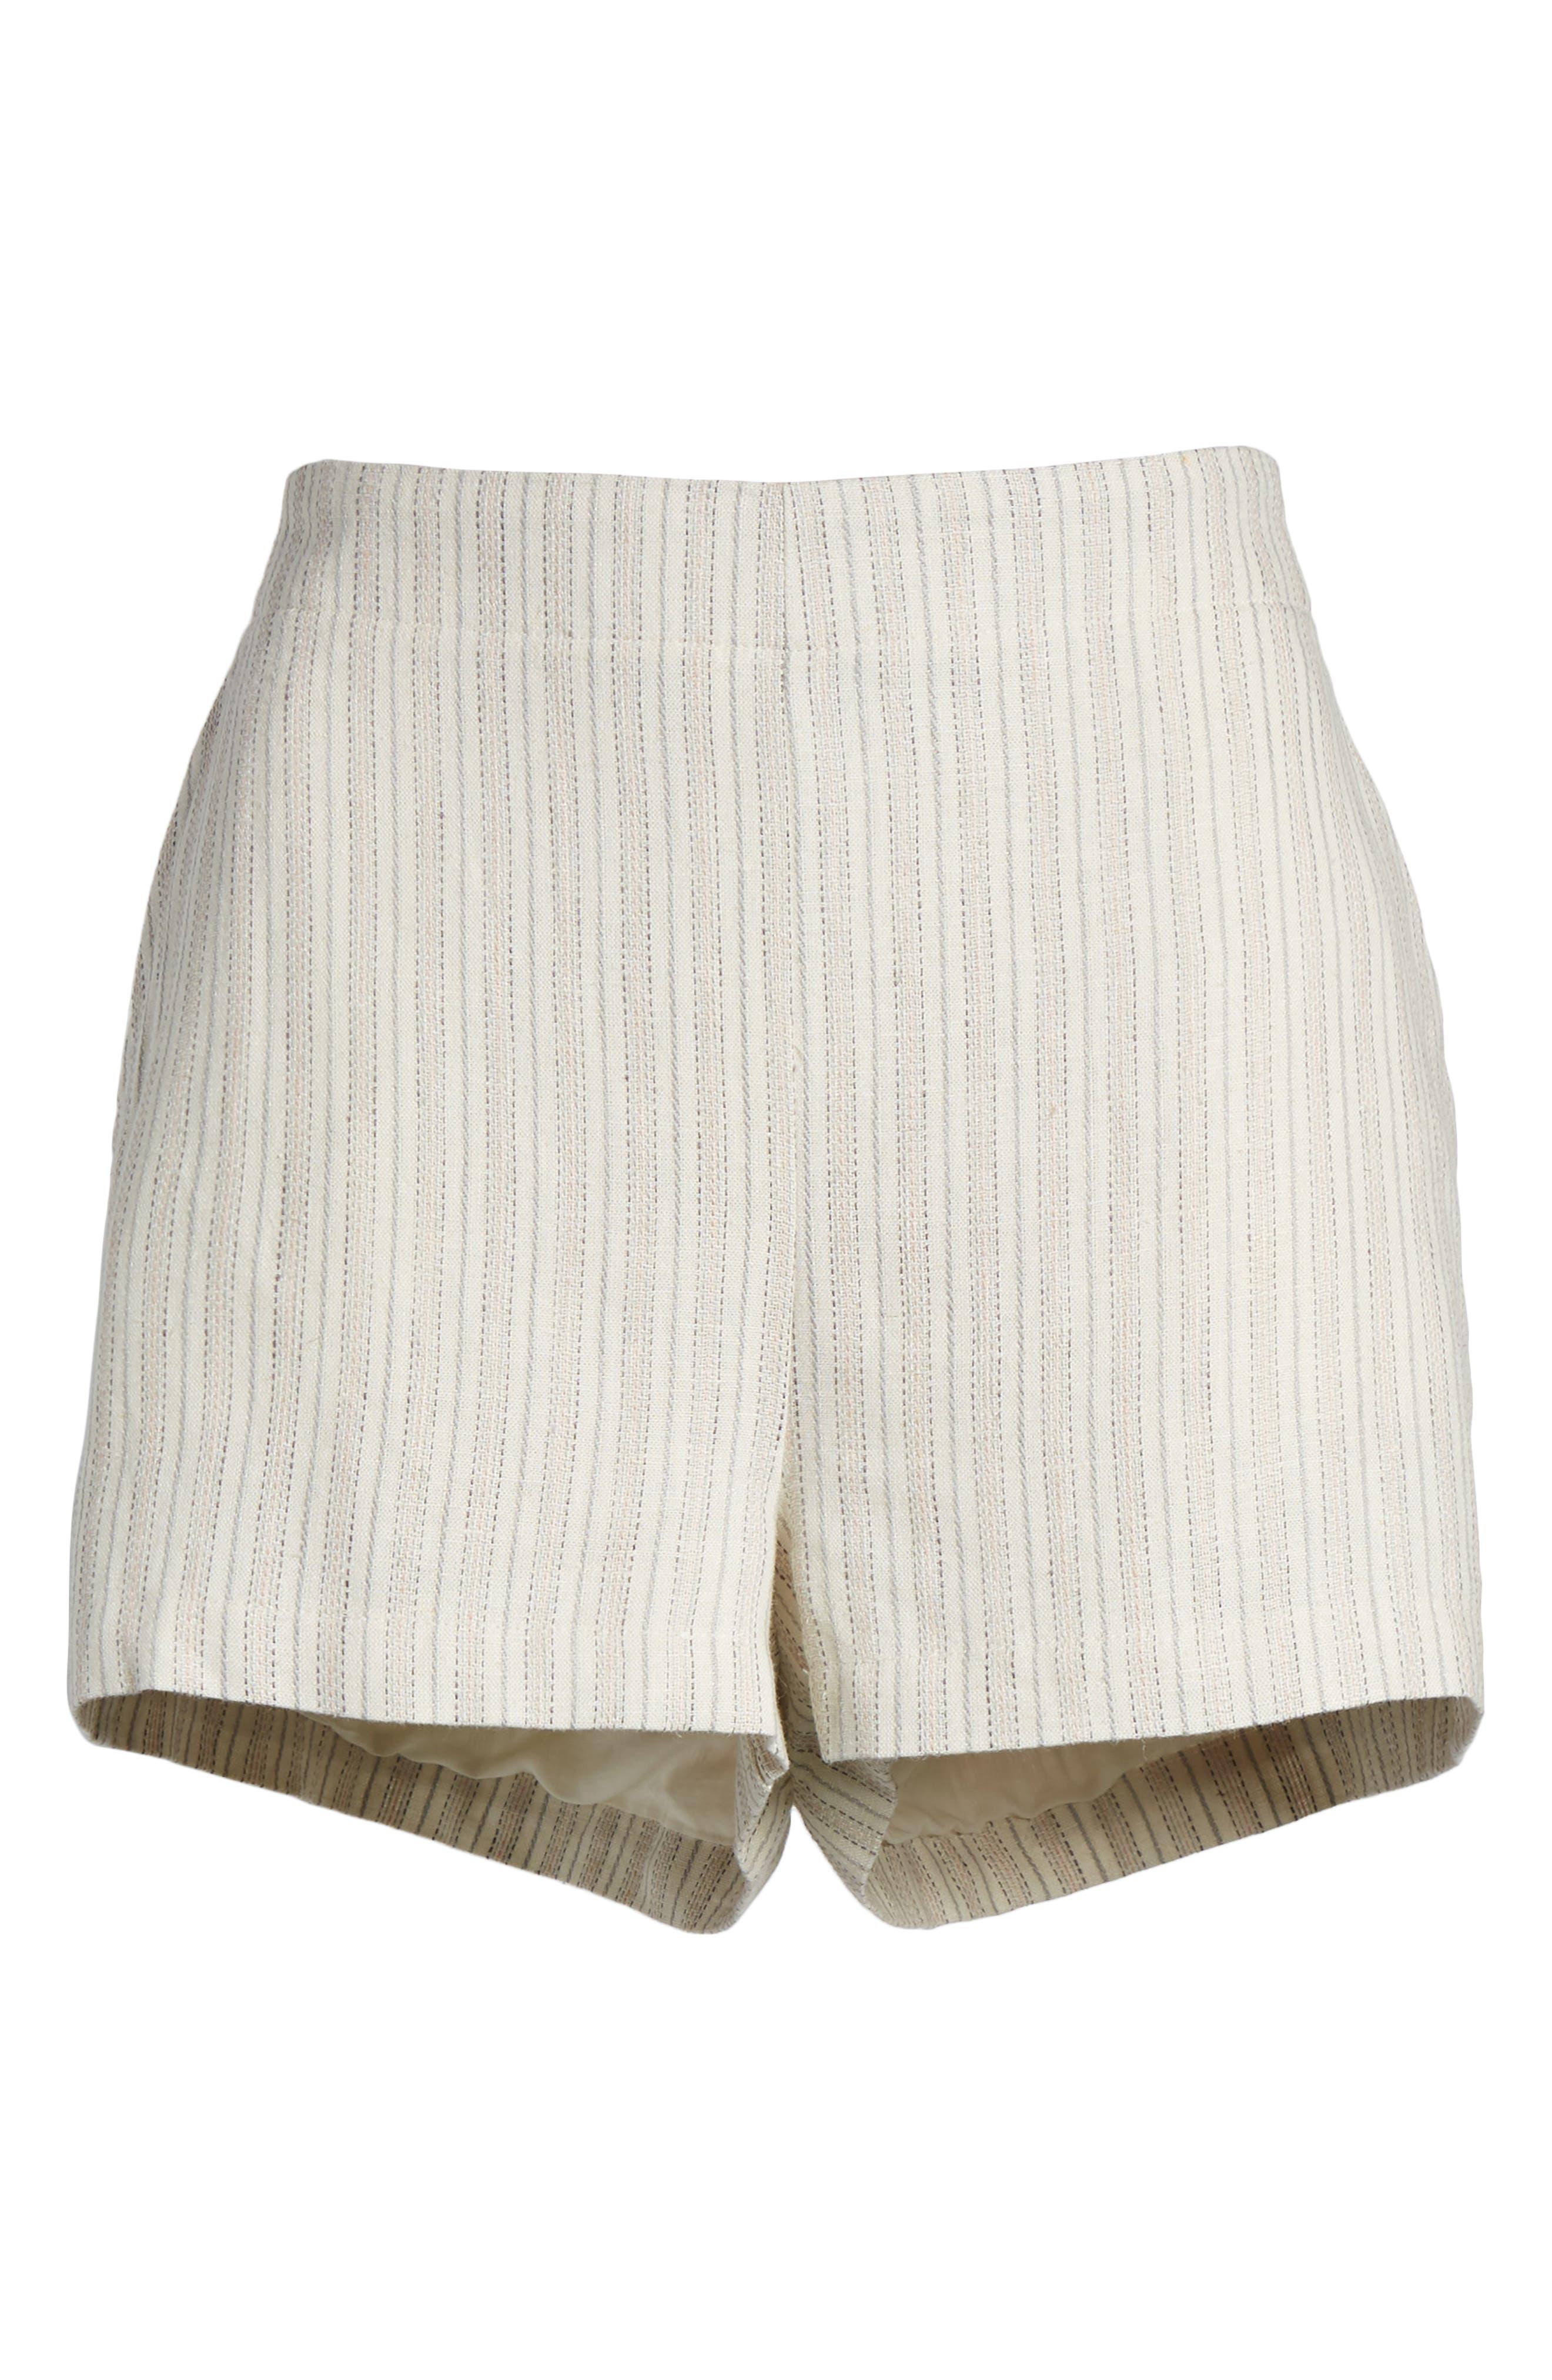 Alta Shorts,                             Alternate thumbnail 7, color,                             Ivory